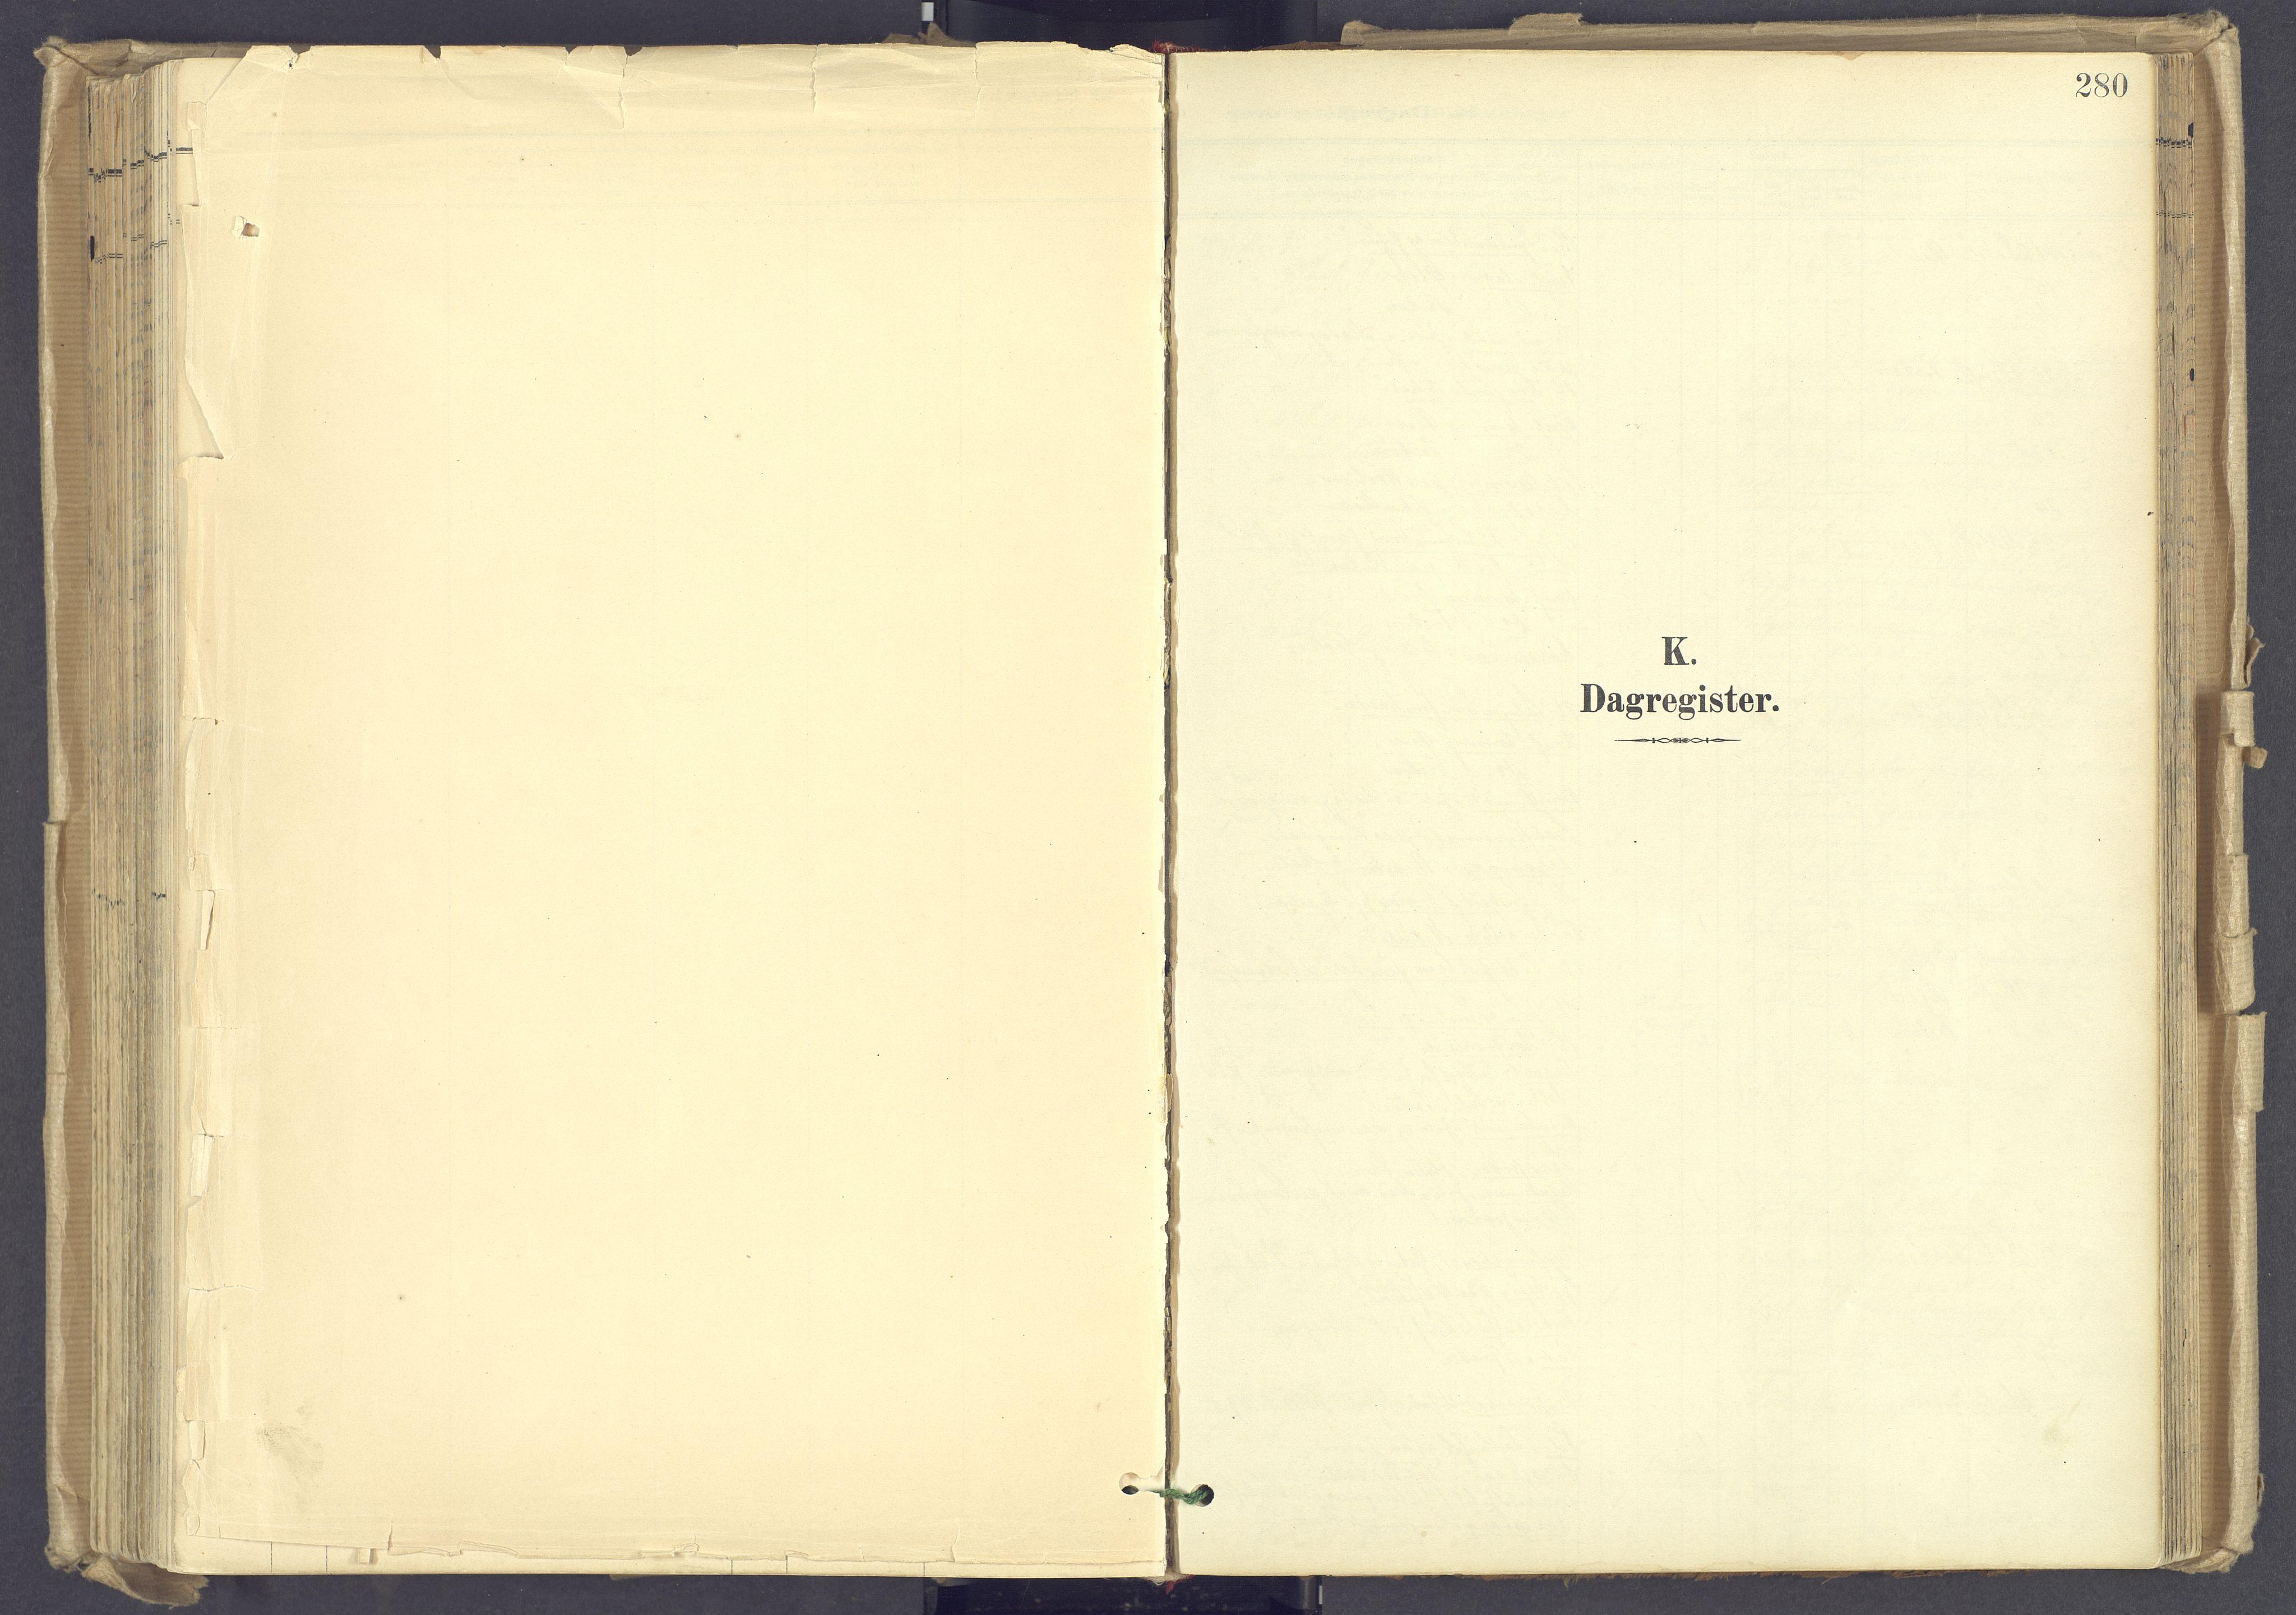 SAH, Øyer prestekontor, Ministerialbok nr. 12, 1897-1920, s. 280